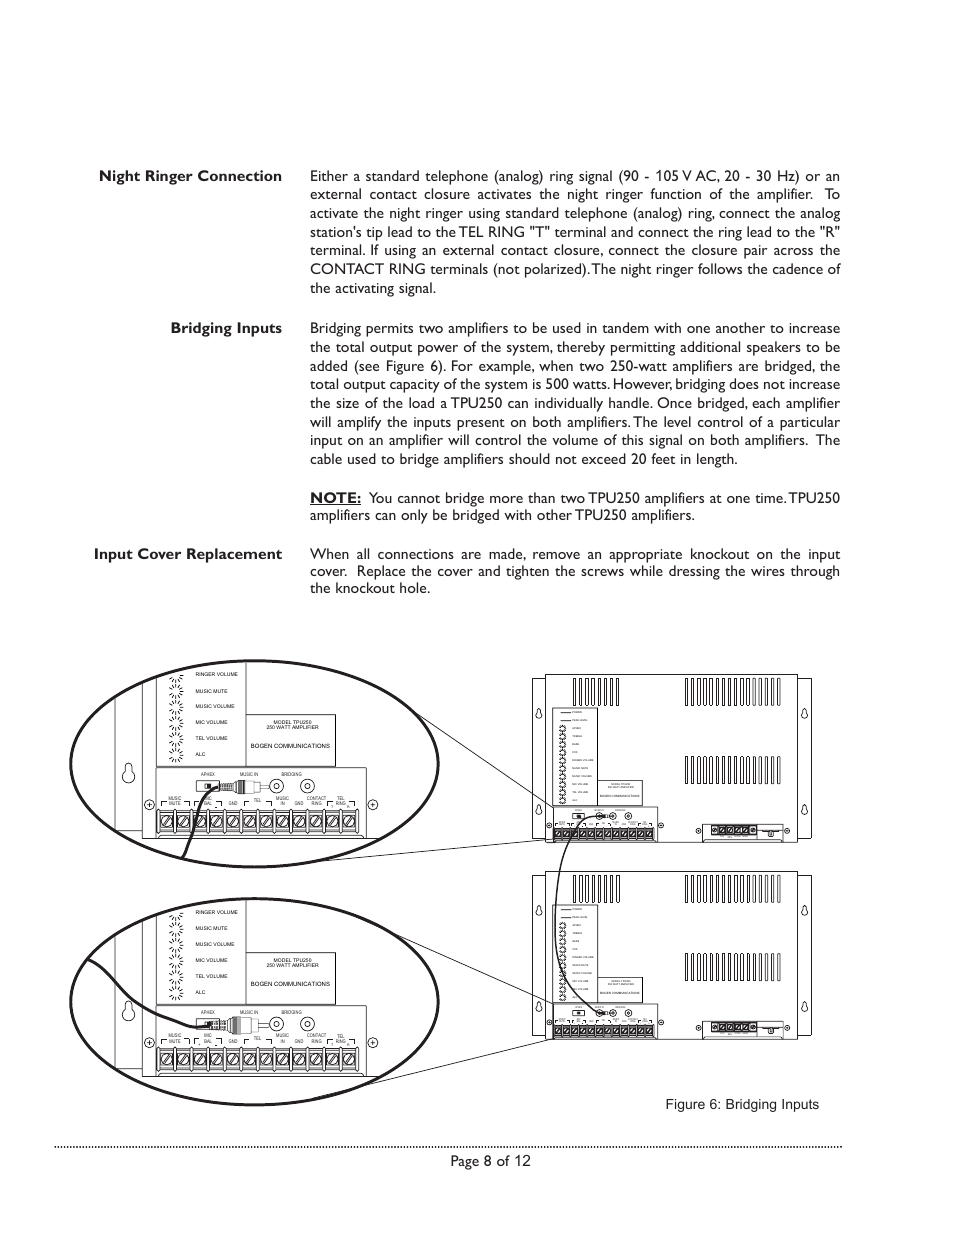 Page 8 of 12, Figure 6: bridging inputs   Bogen TPU250 User Manual  